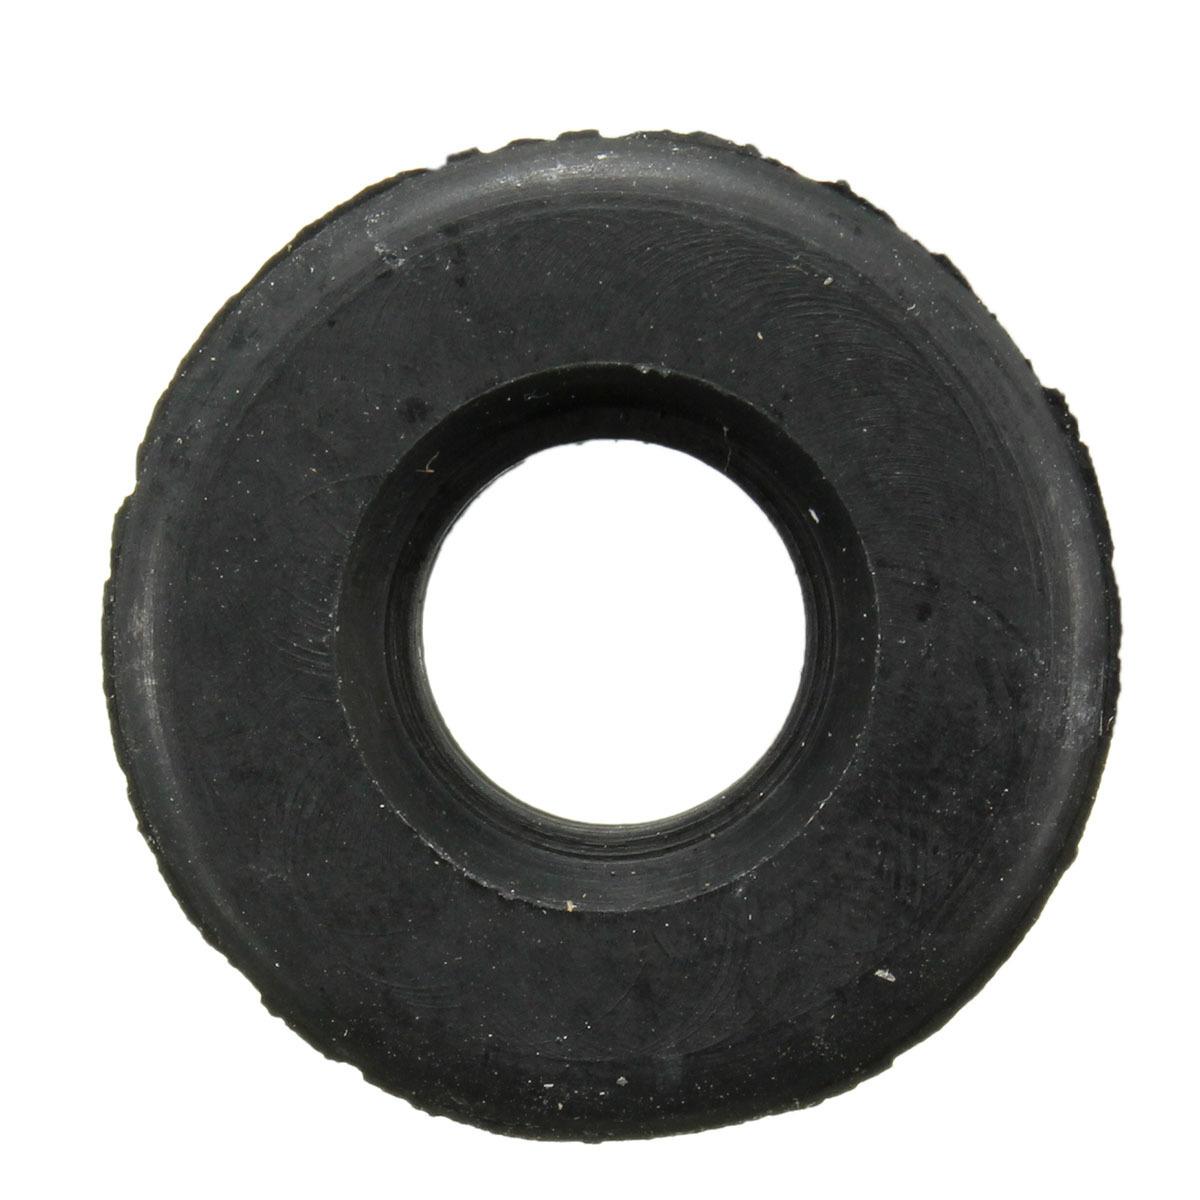 Single valve cover gasket grommet seal washer bolt seal for bmw 11121437395 lazada ph